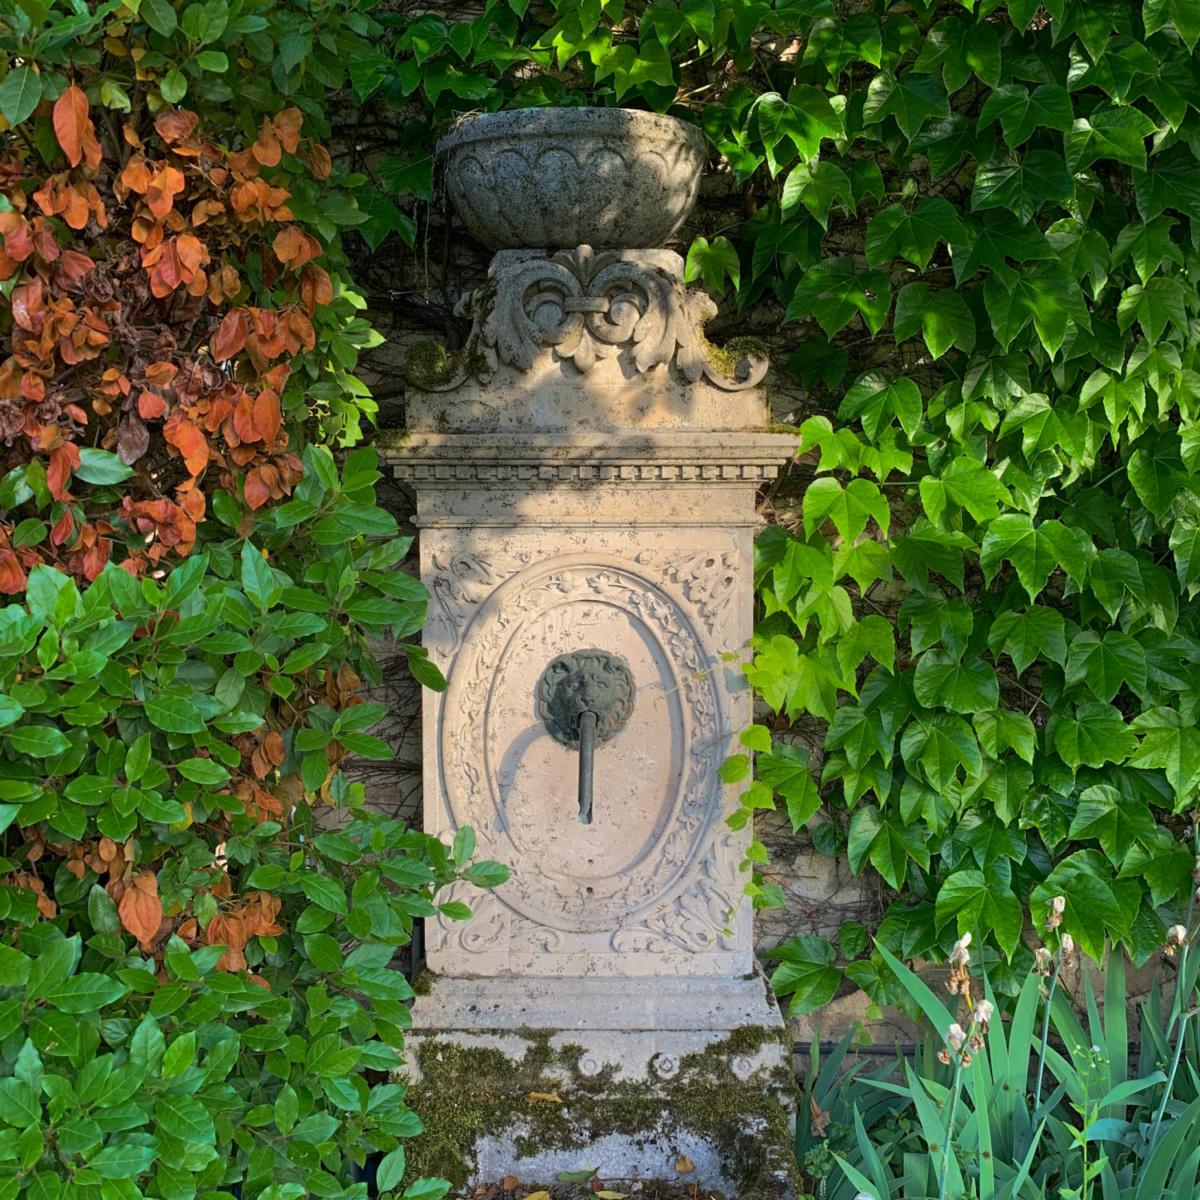 Garden fountain in Levernois, France. More at une femme d'un certain age.